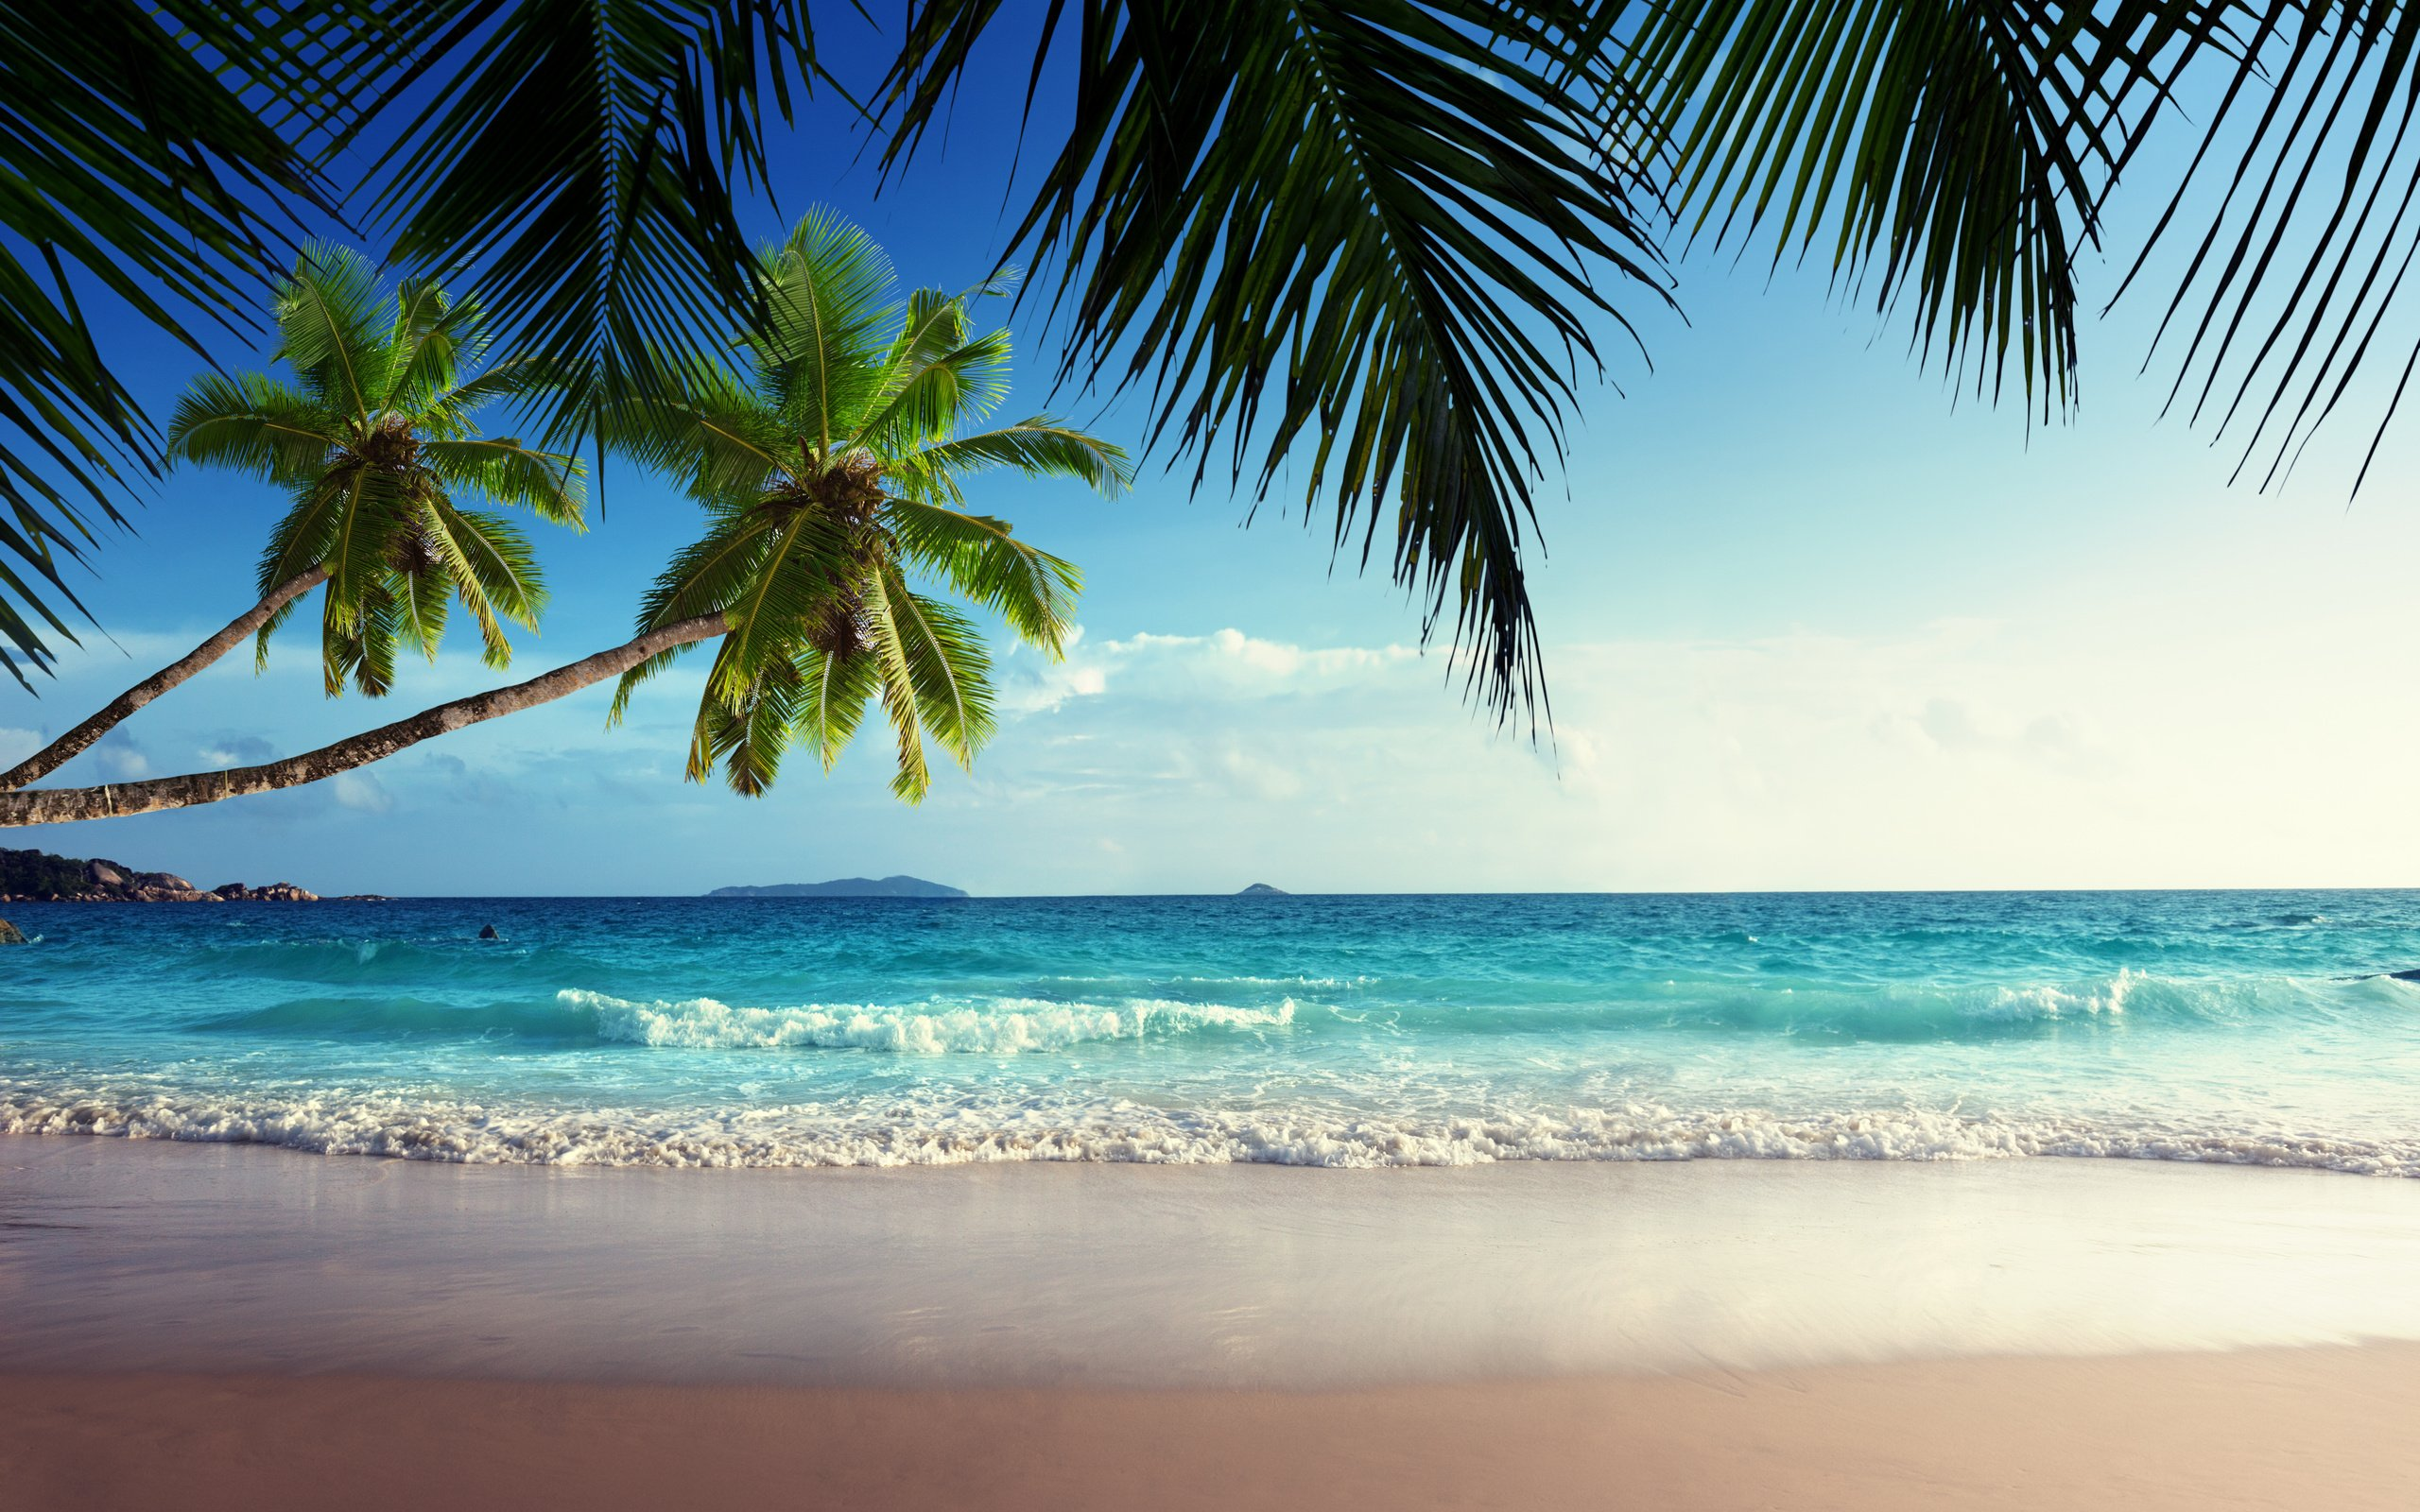 emerald sea paradise sunshine beach sky tropical blue coast